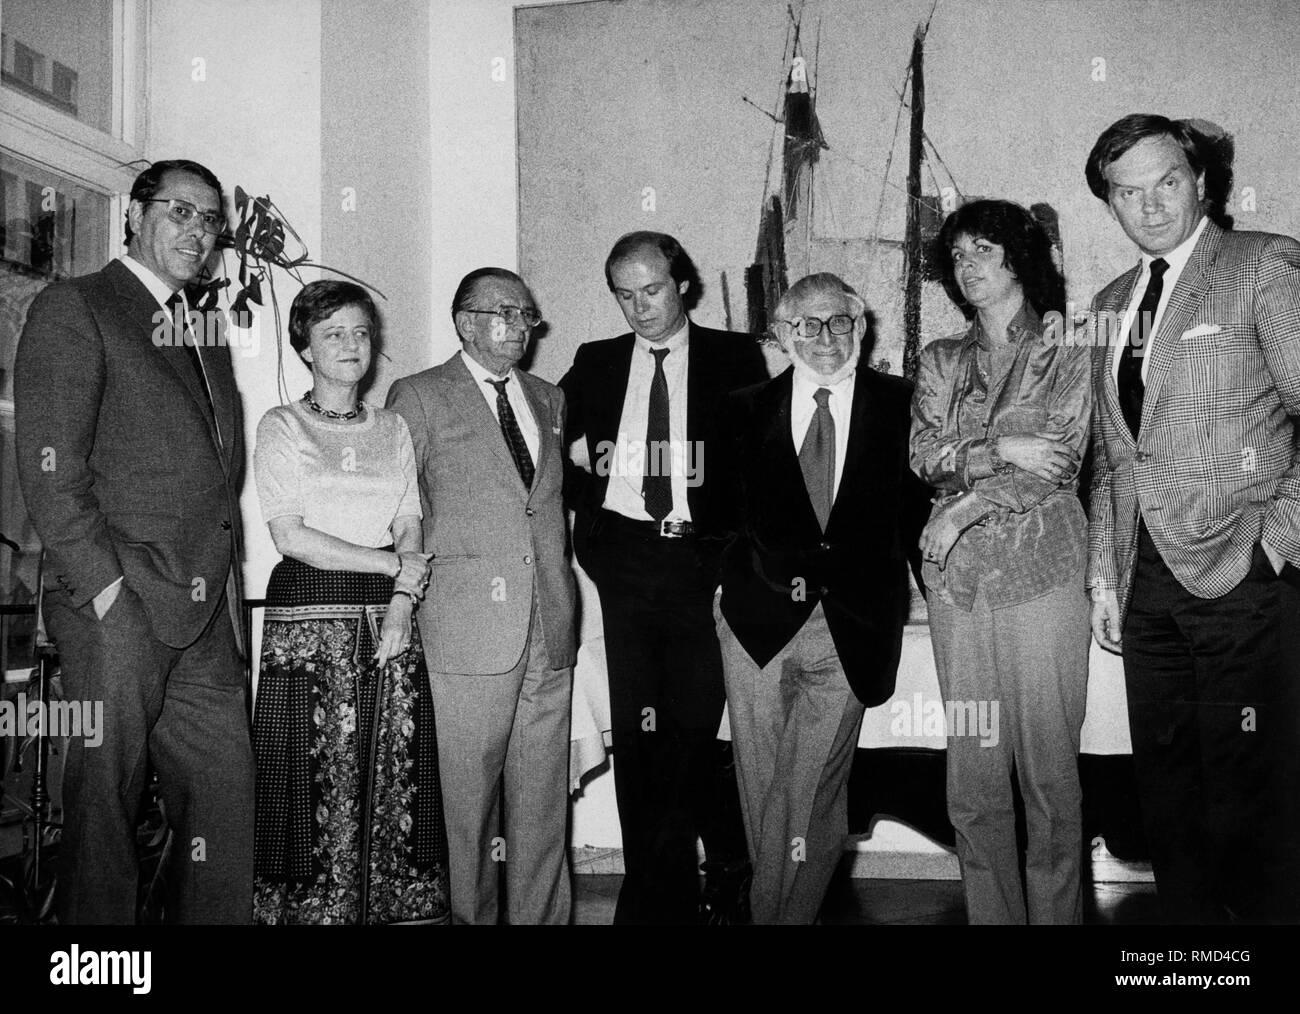 In the Kuenstlerhaus, Kulturreferent Juergen Kolbe (far right) presented the Toucan Prize of the City of Munich for 1981: Barbara Bronne, Carl Borro Schwerla, Joerg Krichbaum, Hermann Stahl, Dagmar Nick and Franz Freisleder. - Stock Image